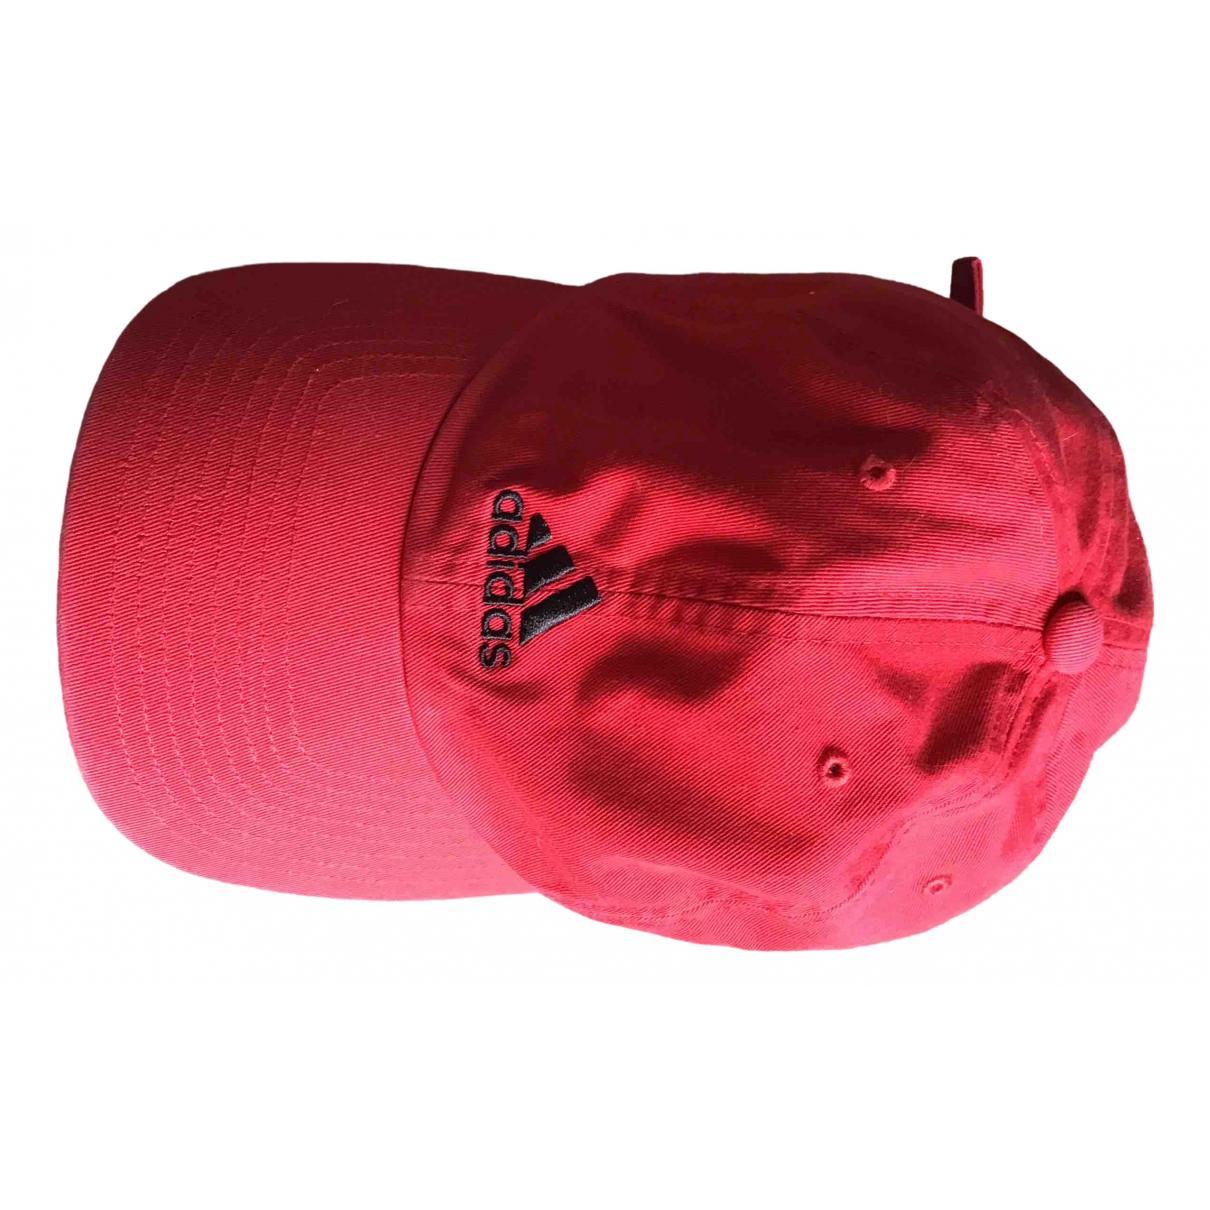 Adidas \N Red Cotton hat for Women M International